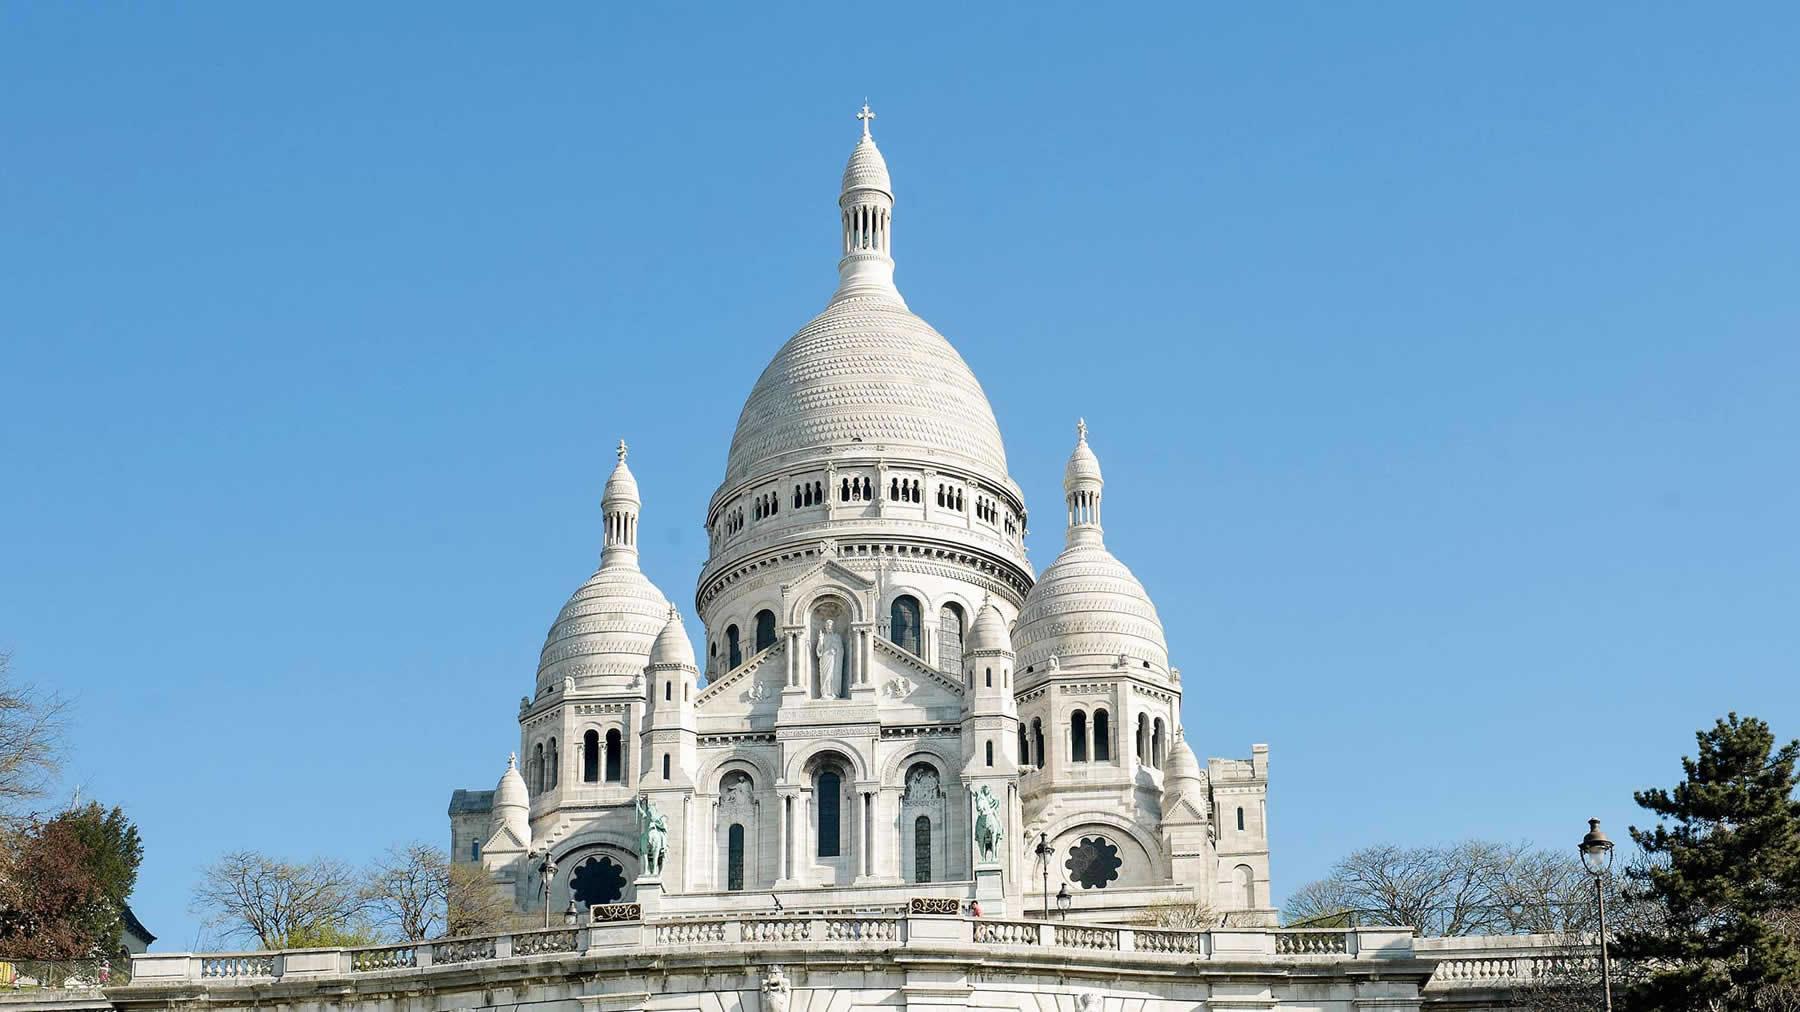 hotel-jardin-de-villiers-paris-slide-03